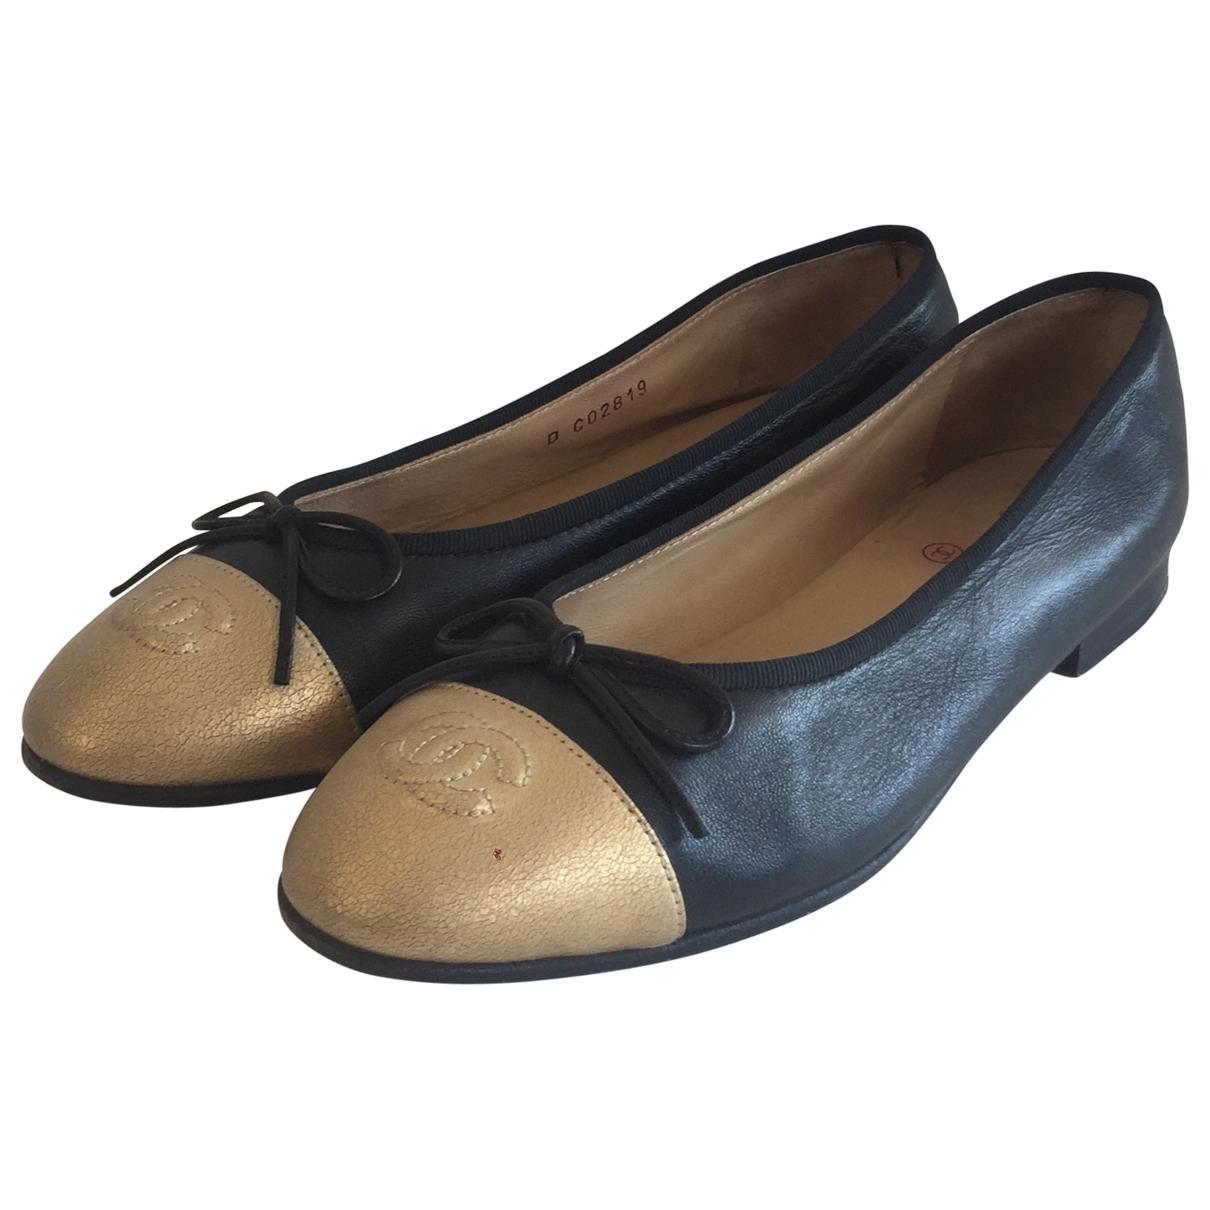 Chanel \N Black Leather Ballet flats for Women 39.5 EU